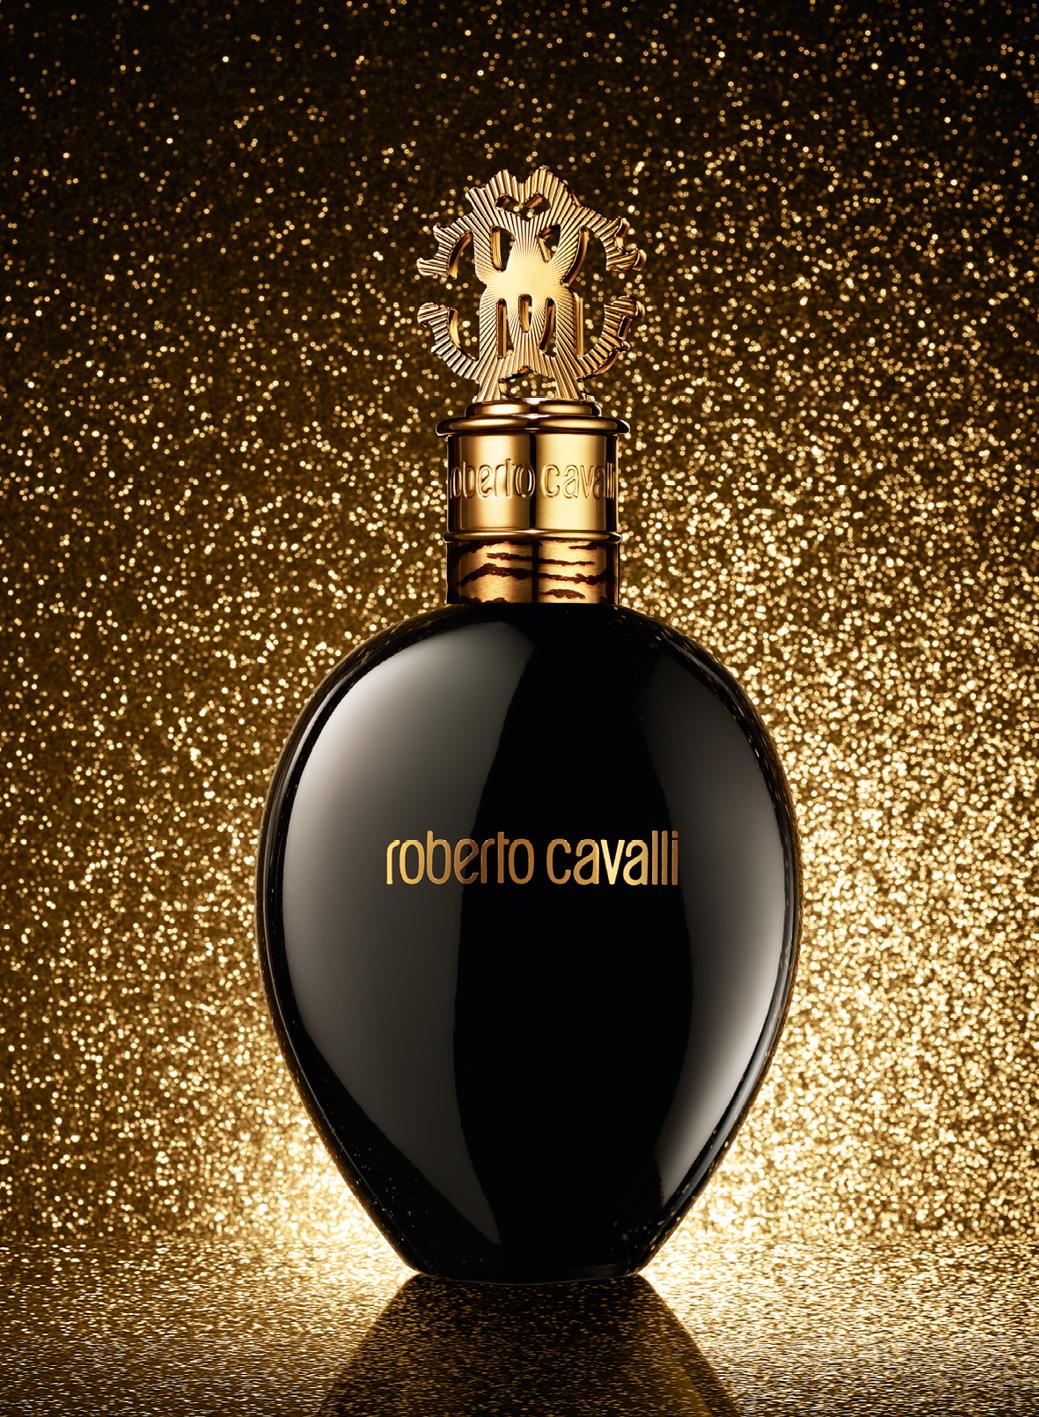 Roberto Cavalli - Nero Assoluto   Marcas   Roberto cavalli, Cavalli ... 3575af9966